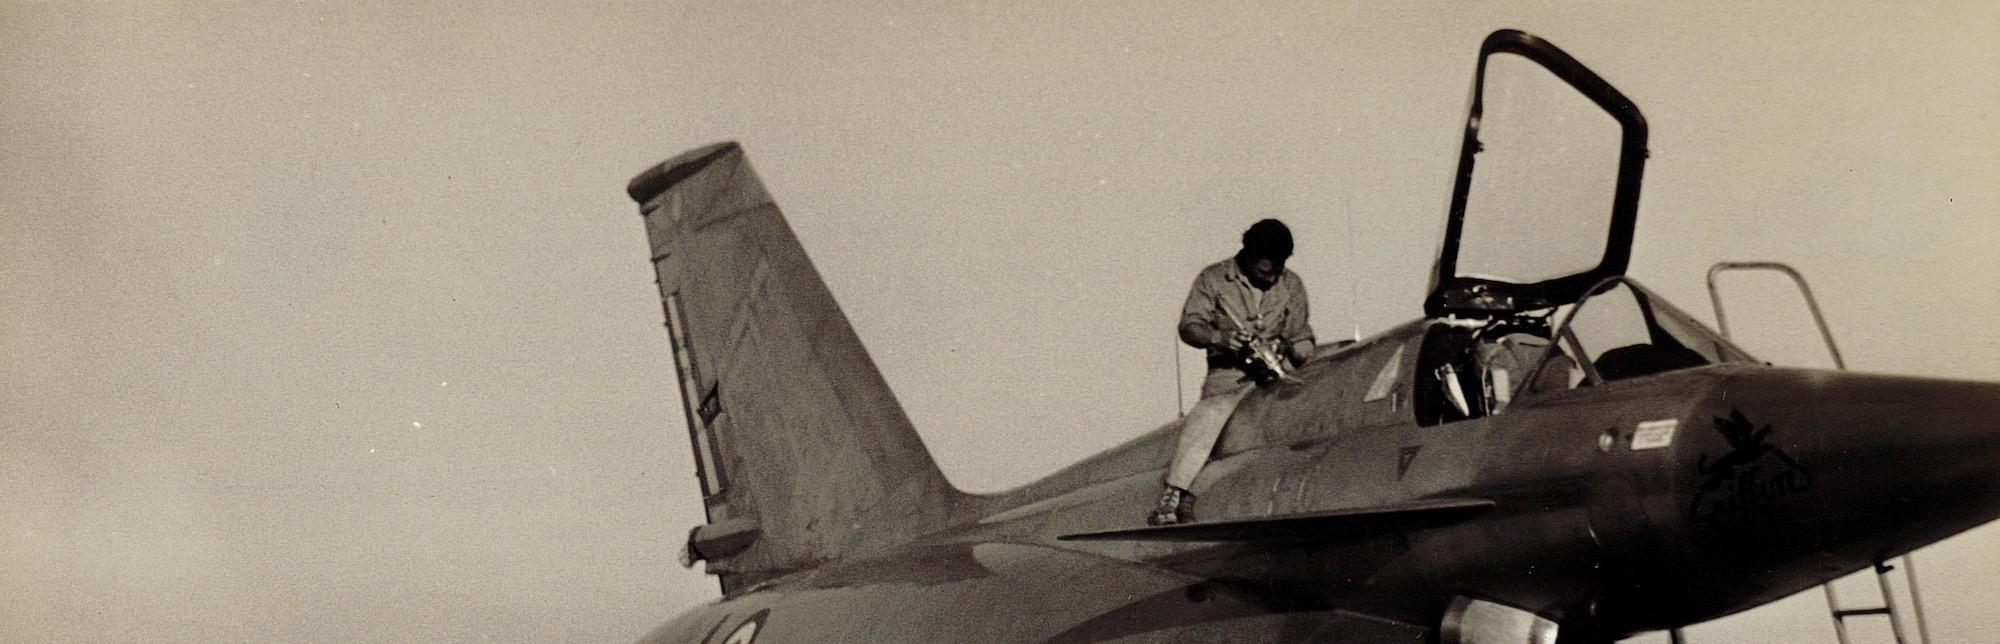 "OMEGA FLIGHTMASTER <br>""ESSAIS EN VOL 1972"""